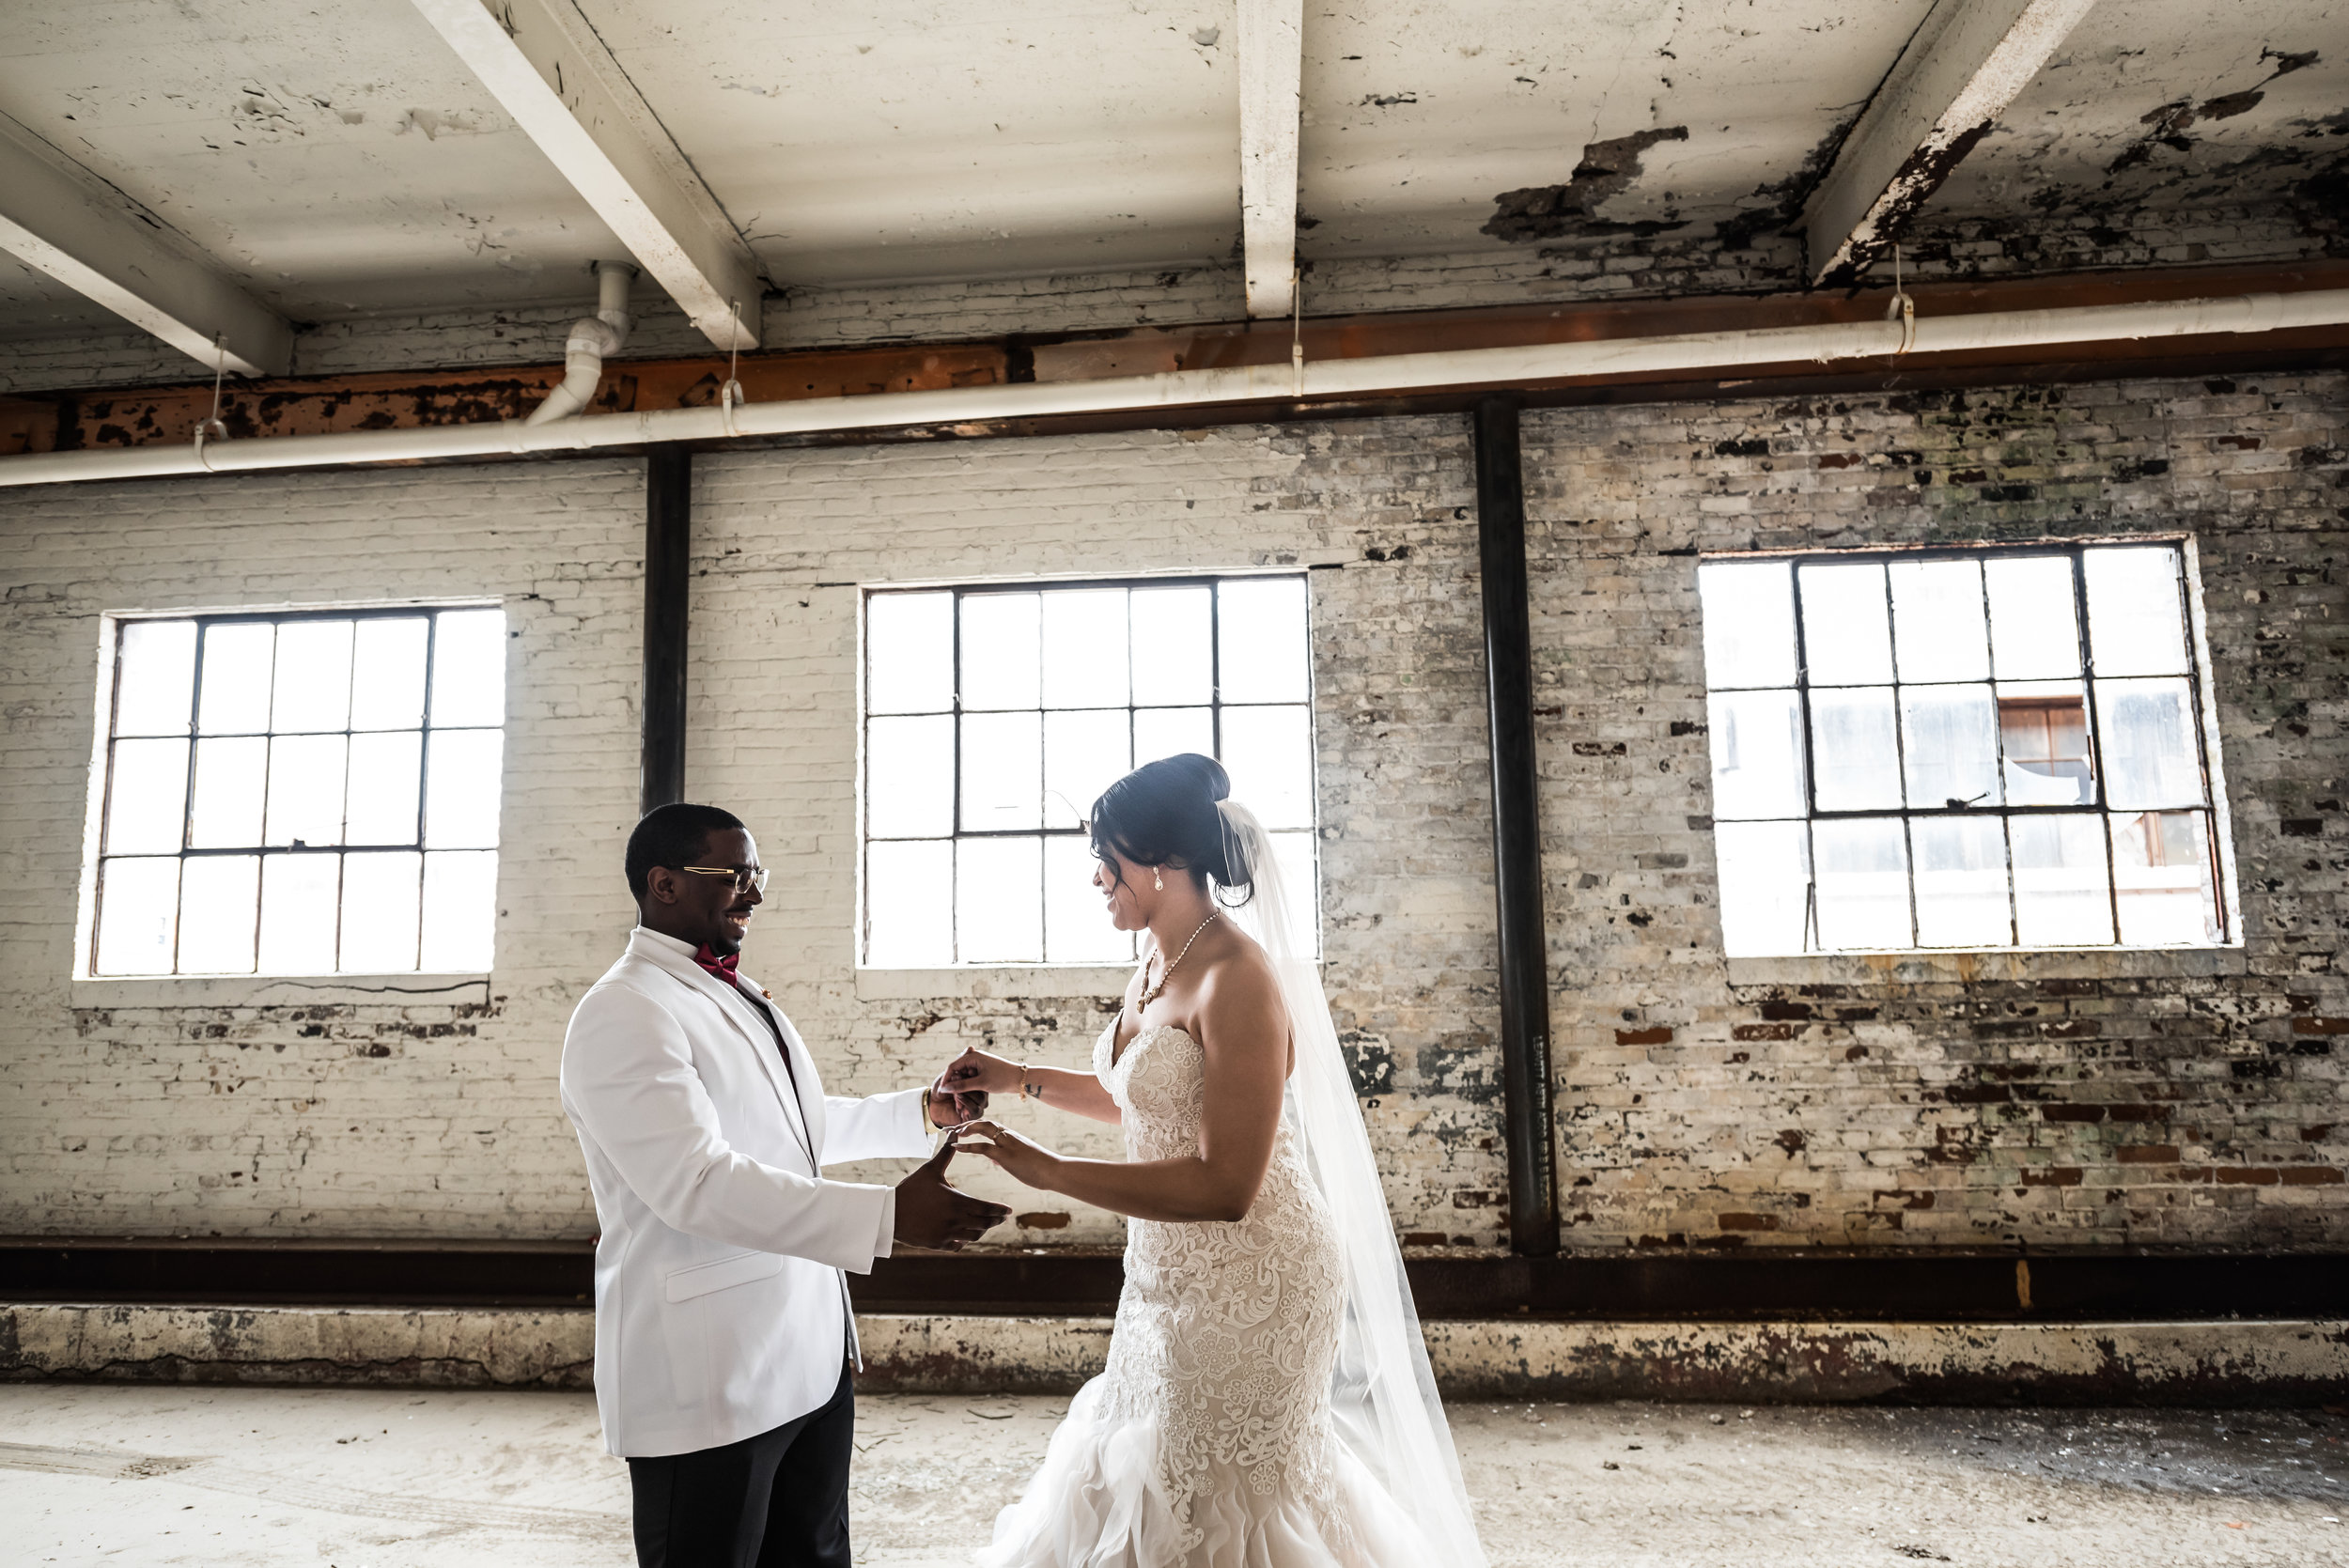 Burlington Iowa Wedding Midwest Photographer Melissa Cervantes _ Chantelle and Isaiah 104dd.jpg